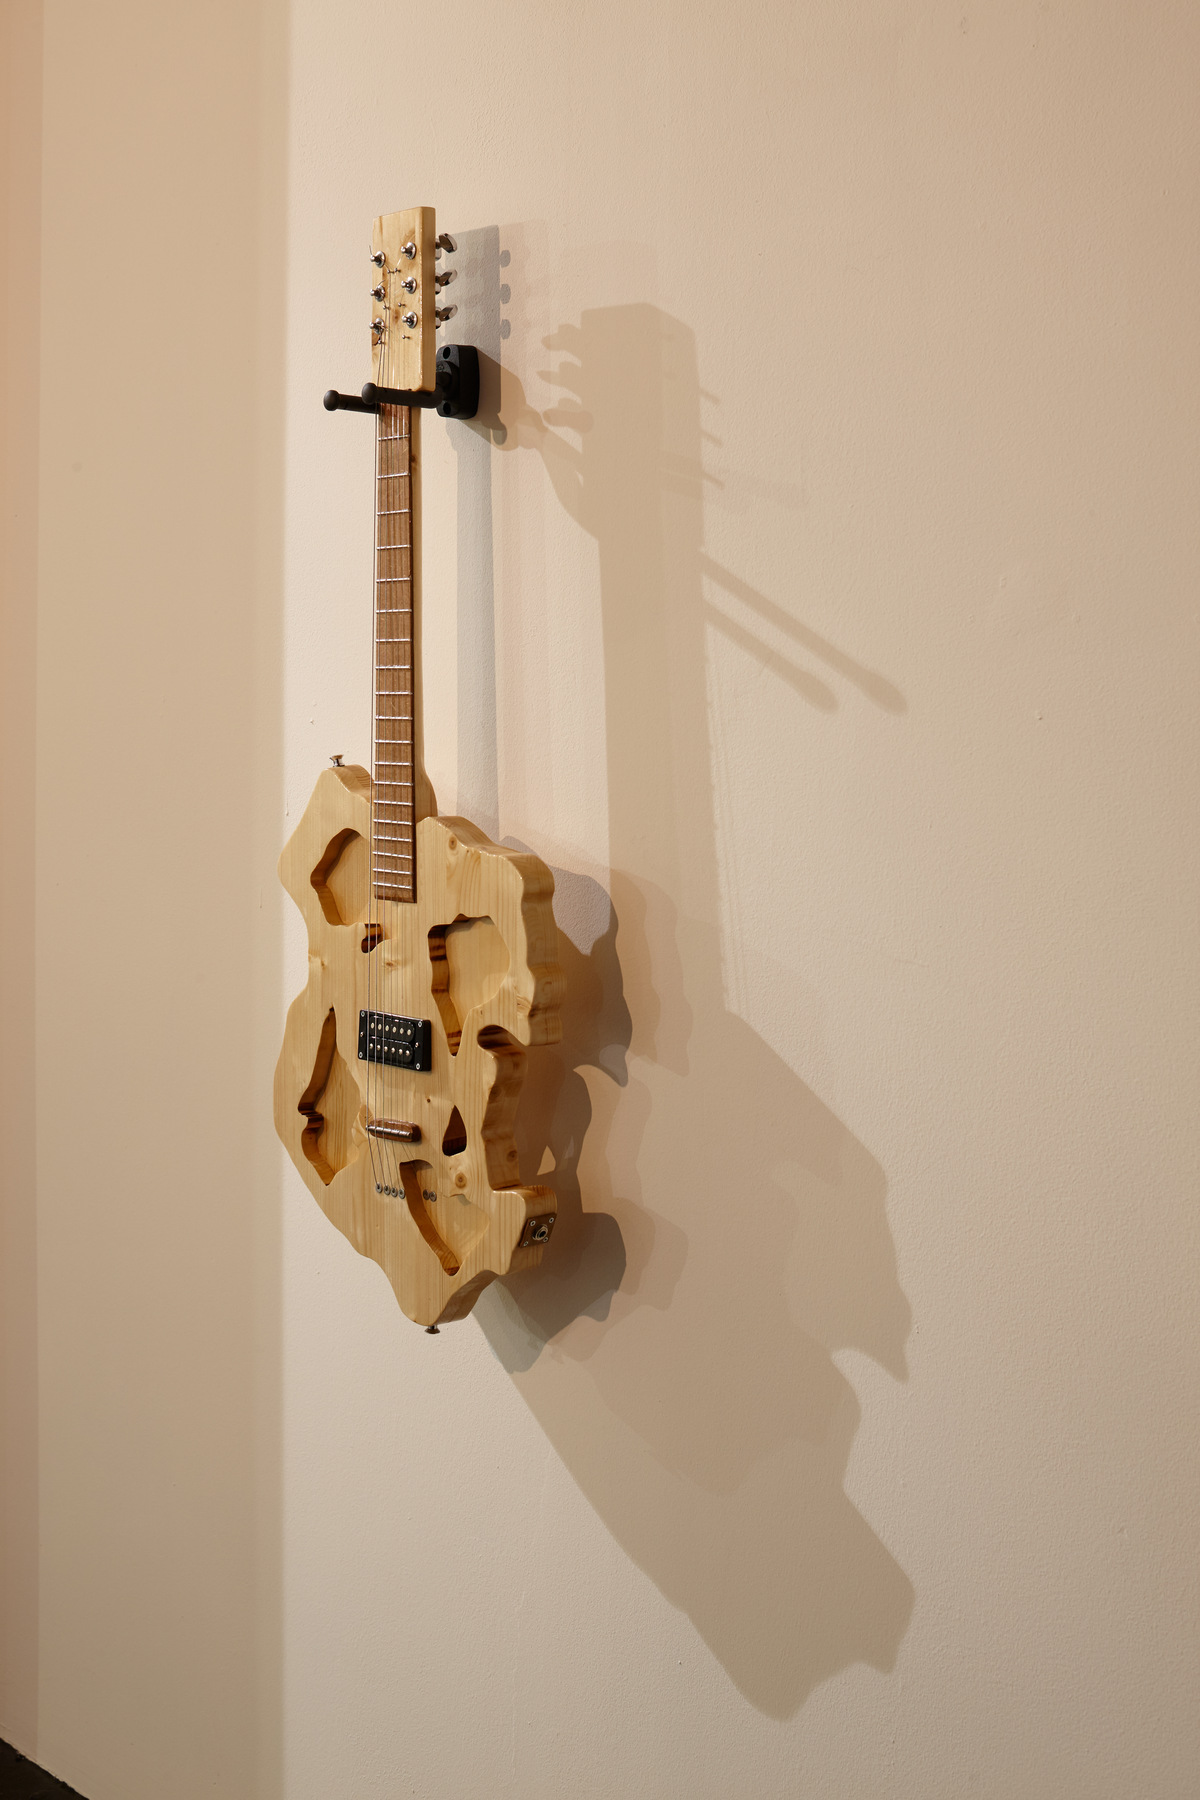 Flavio Merlo - Guitar I, (detail) 2015